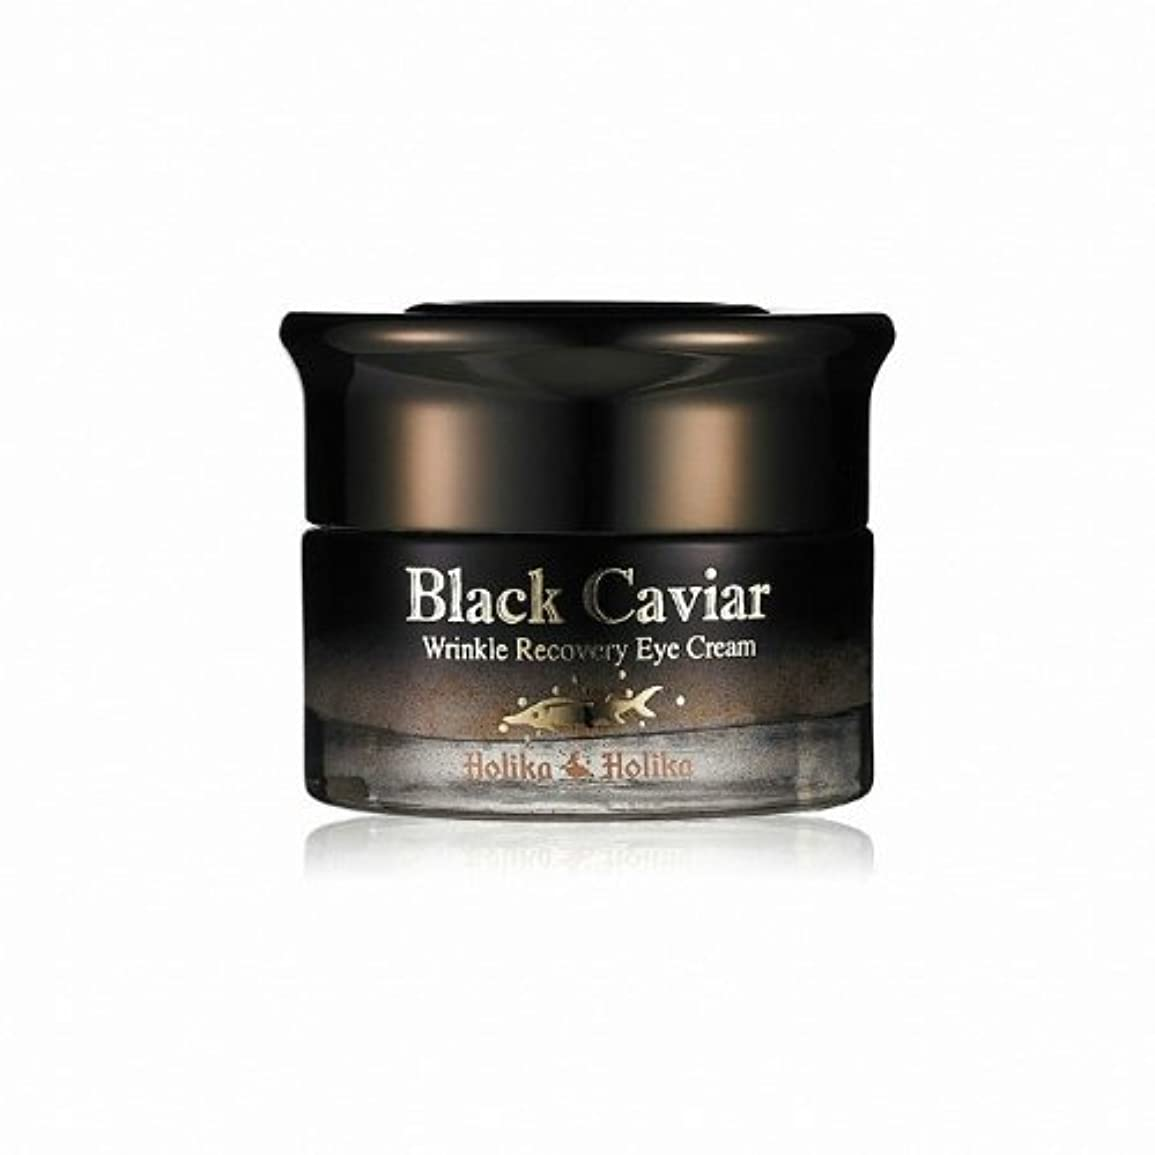 Holika Holika Black Caviar Anti Wrinkle Recovery Eye Cream [Korean Import]